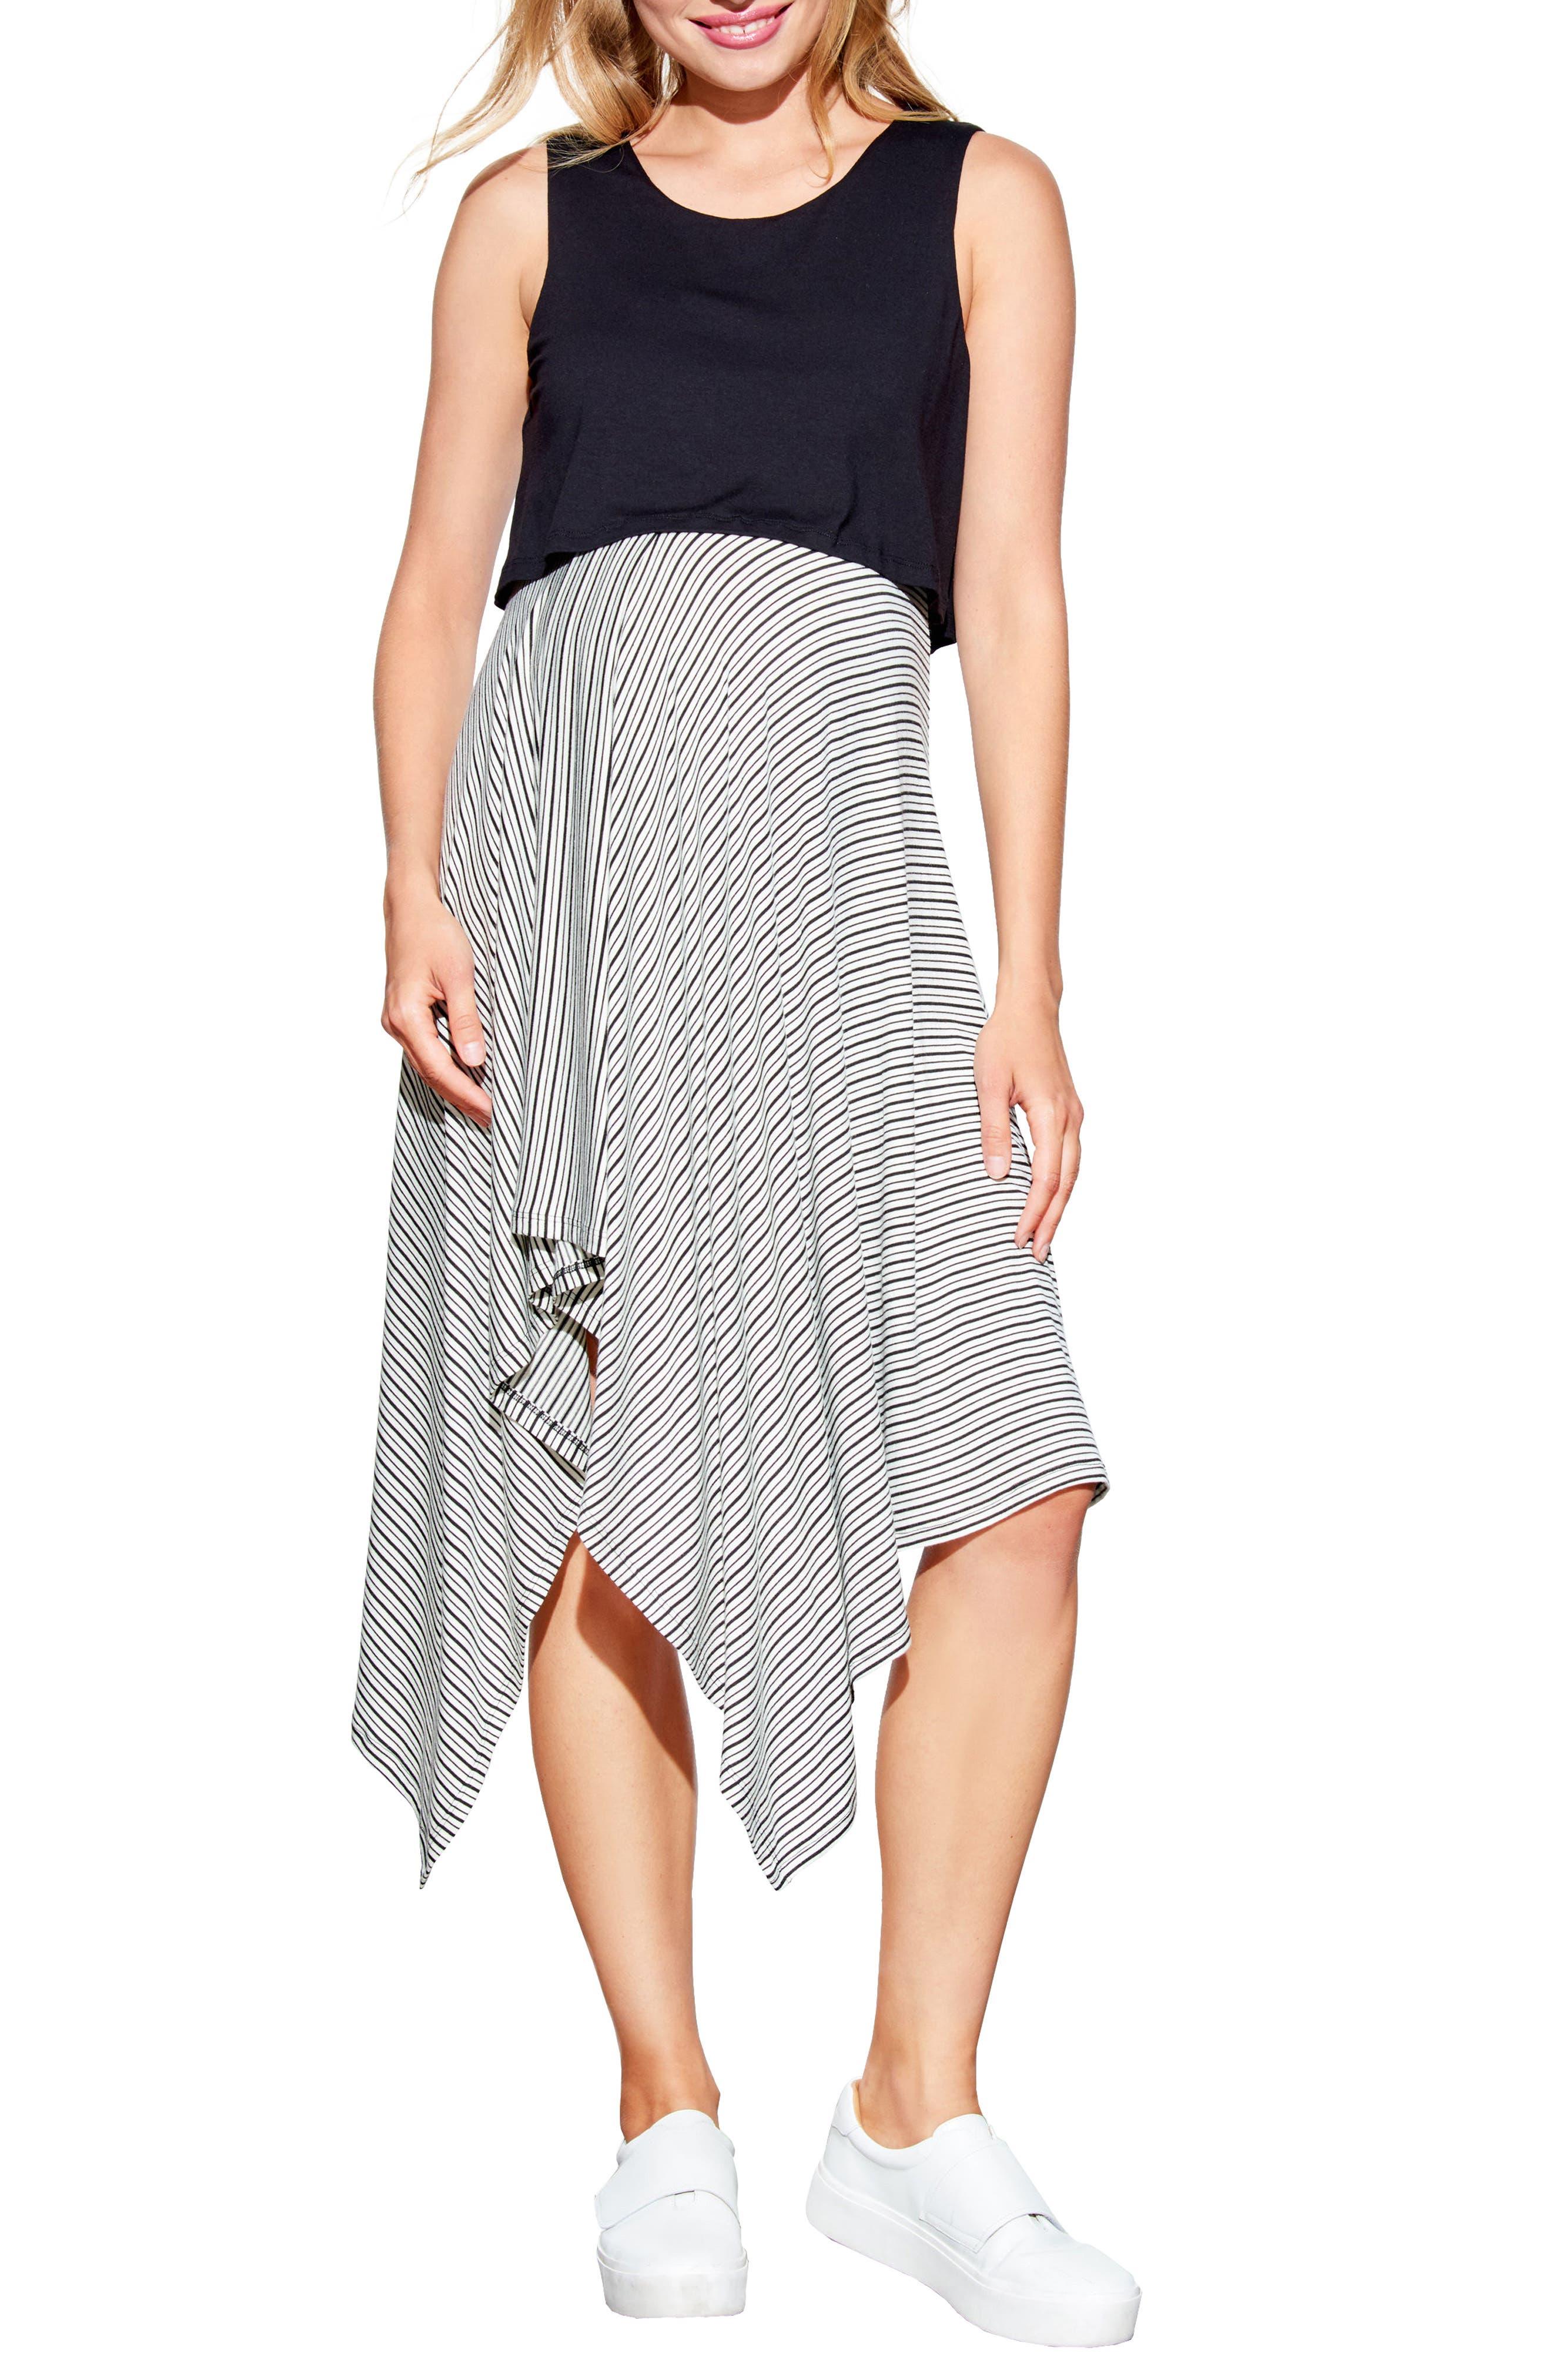 Alternate Image 1 Selected - Maternal America Handkerchief Hem Maternity/Nursing Dress